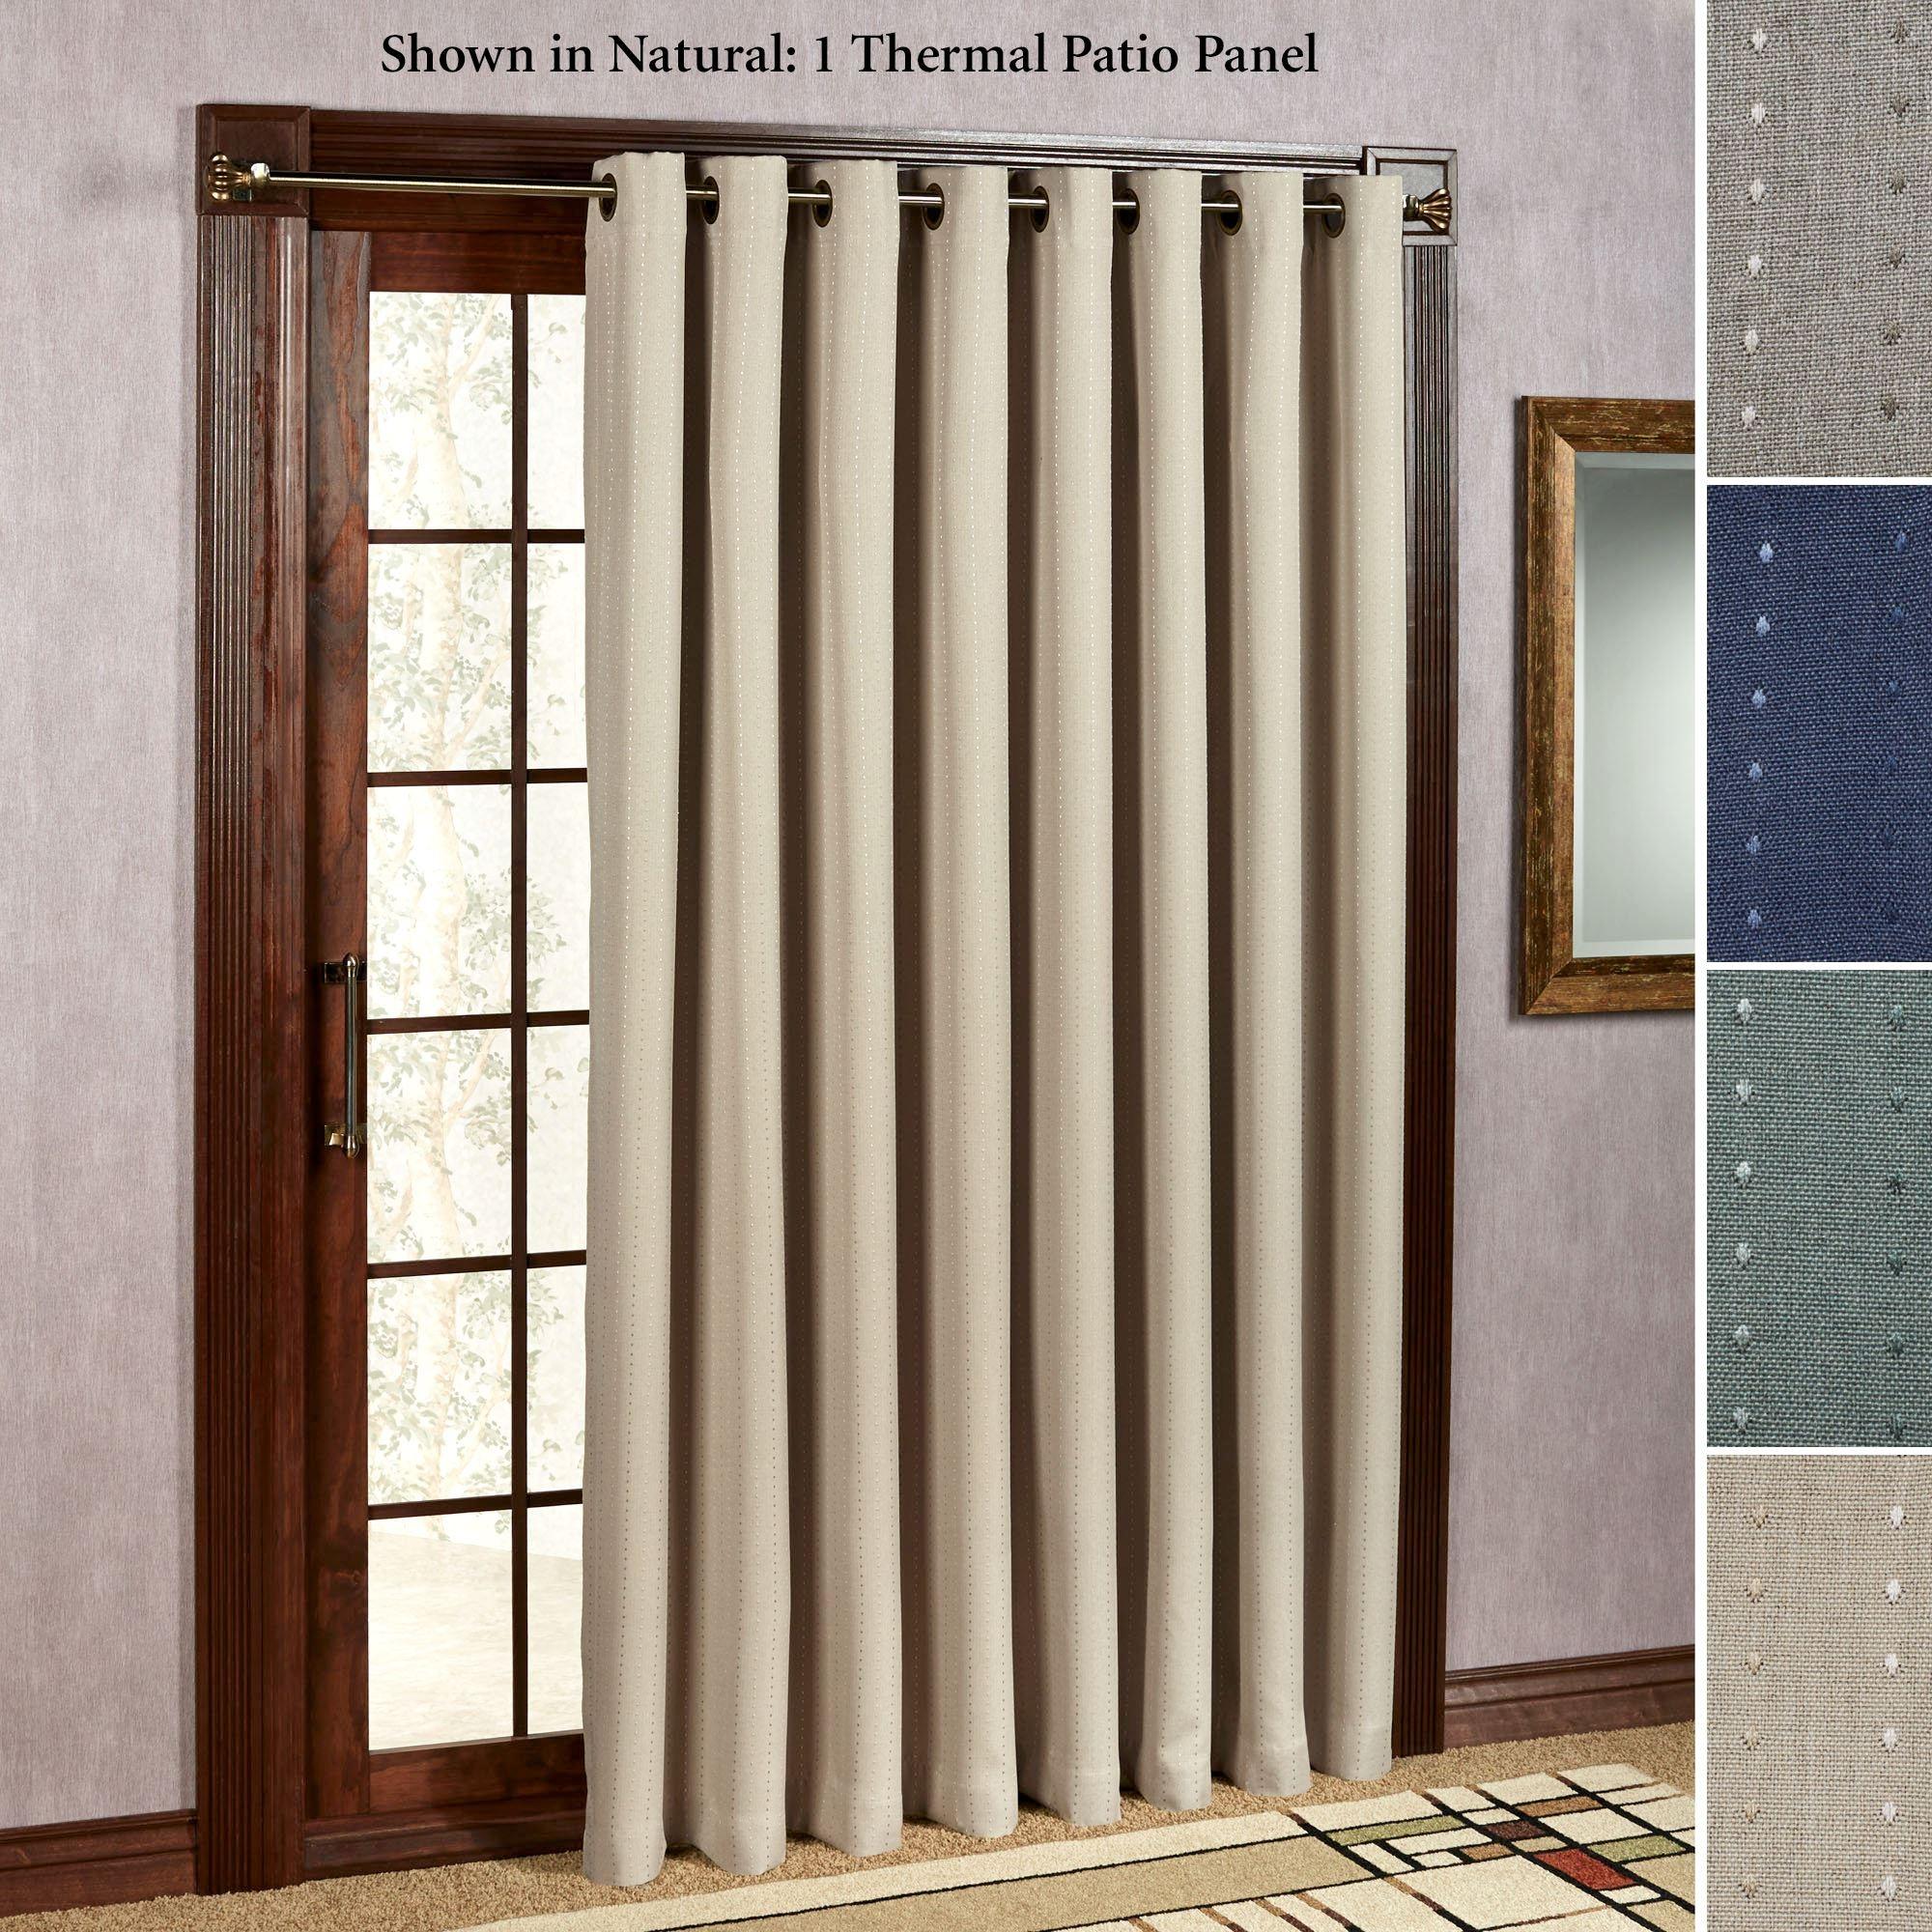 Sliding Glass Door Size Curtainspatio doors patio door curtain panels touch of class curtains for